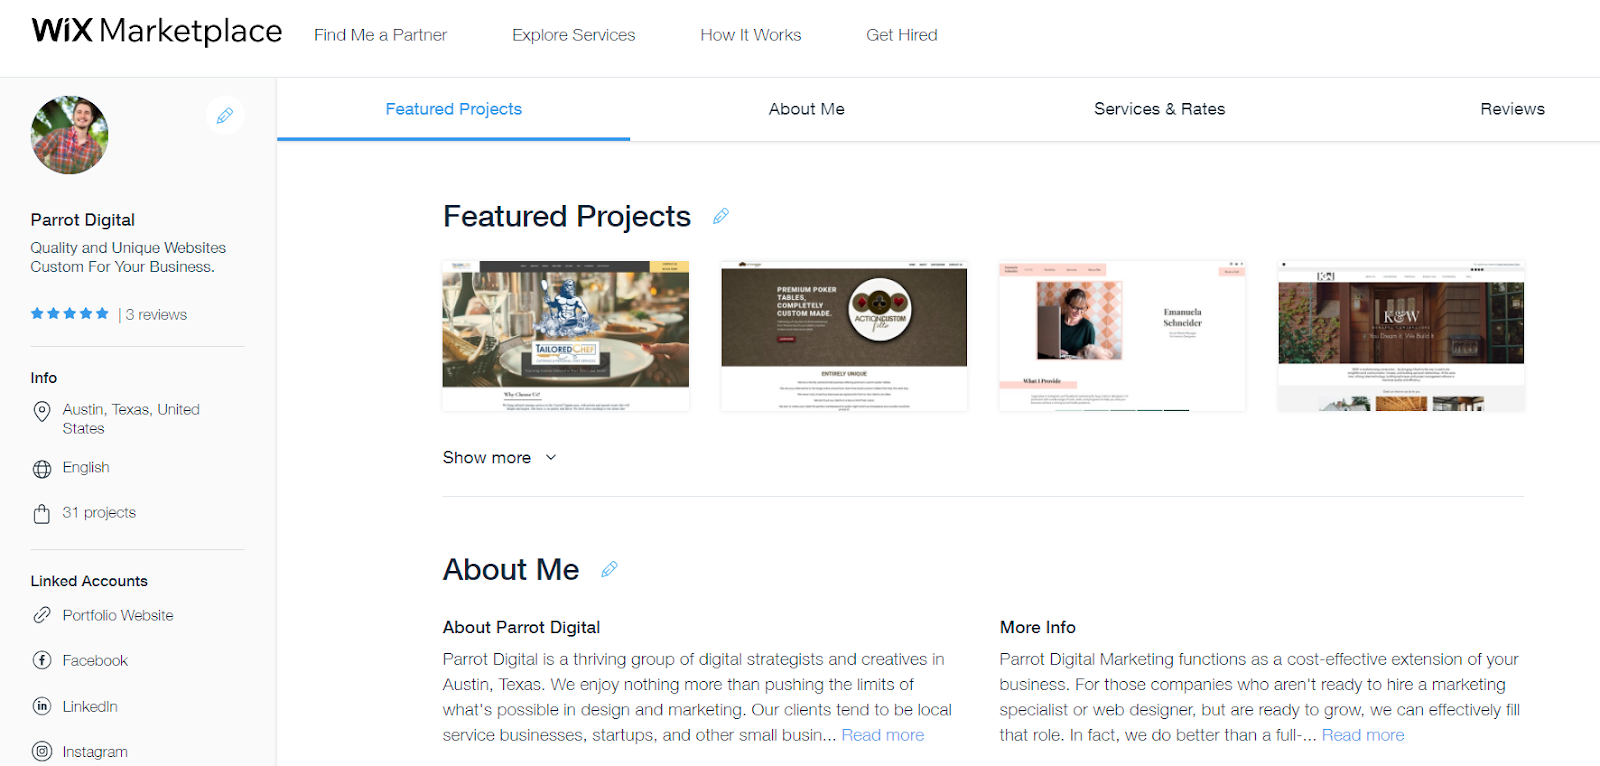 wix marketplace profile for parrot digital marketing